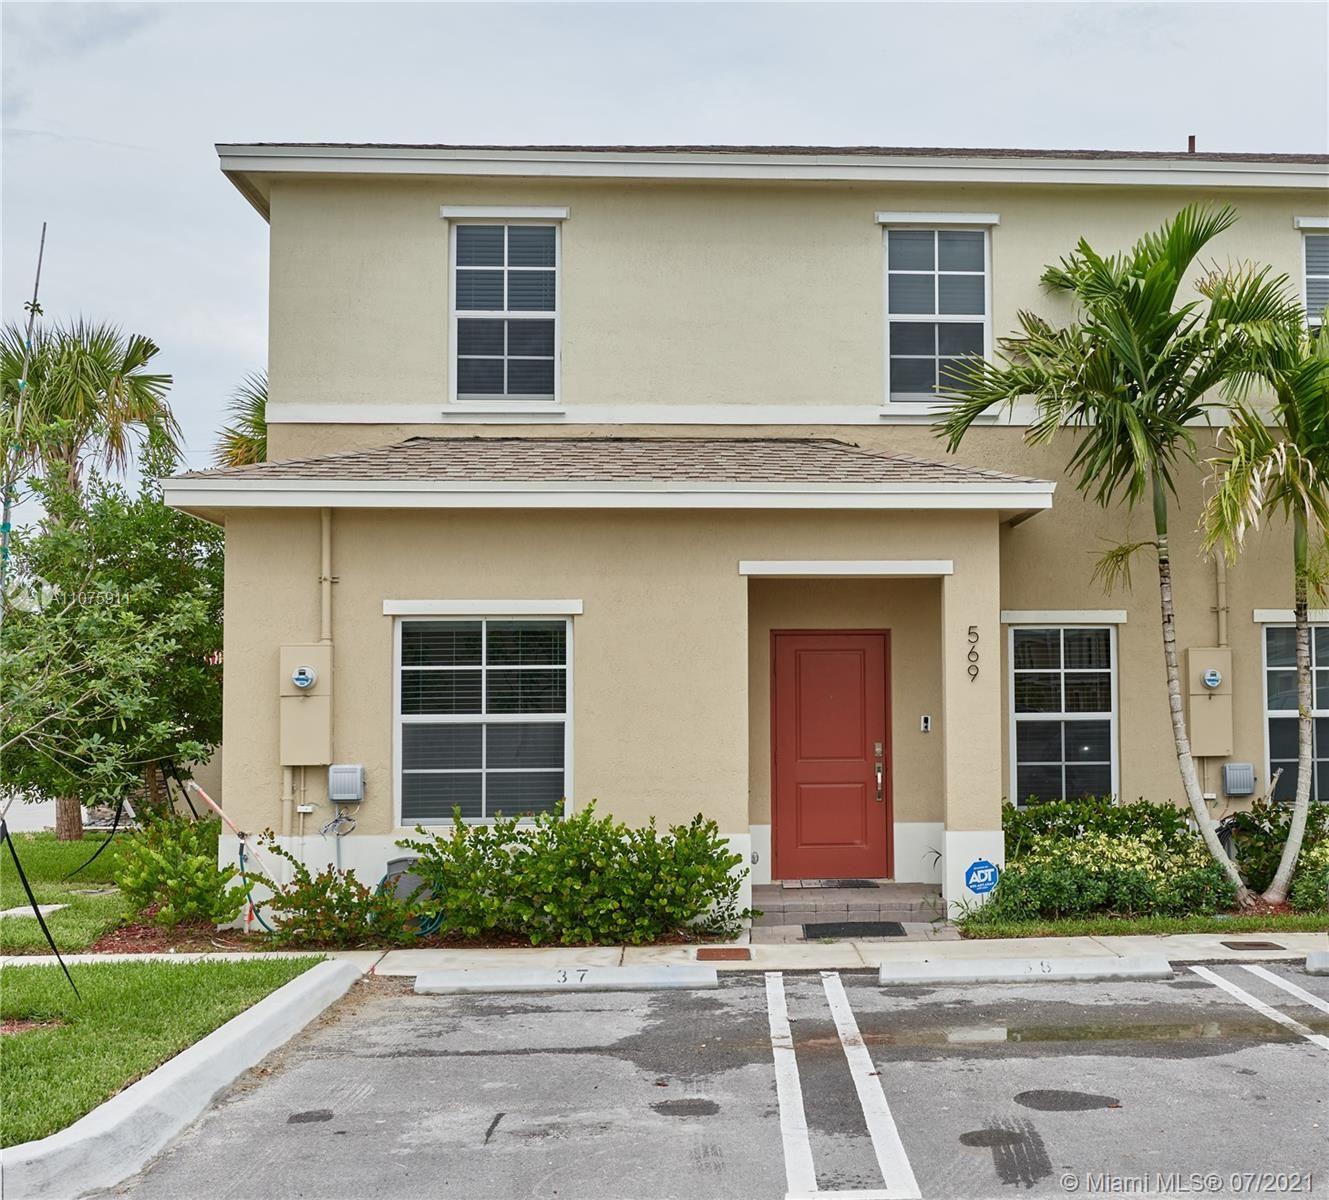 569 NE 5th Pl, Florida City, FL 33034 - #: A11075911